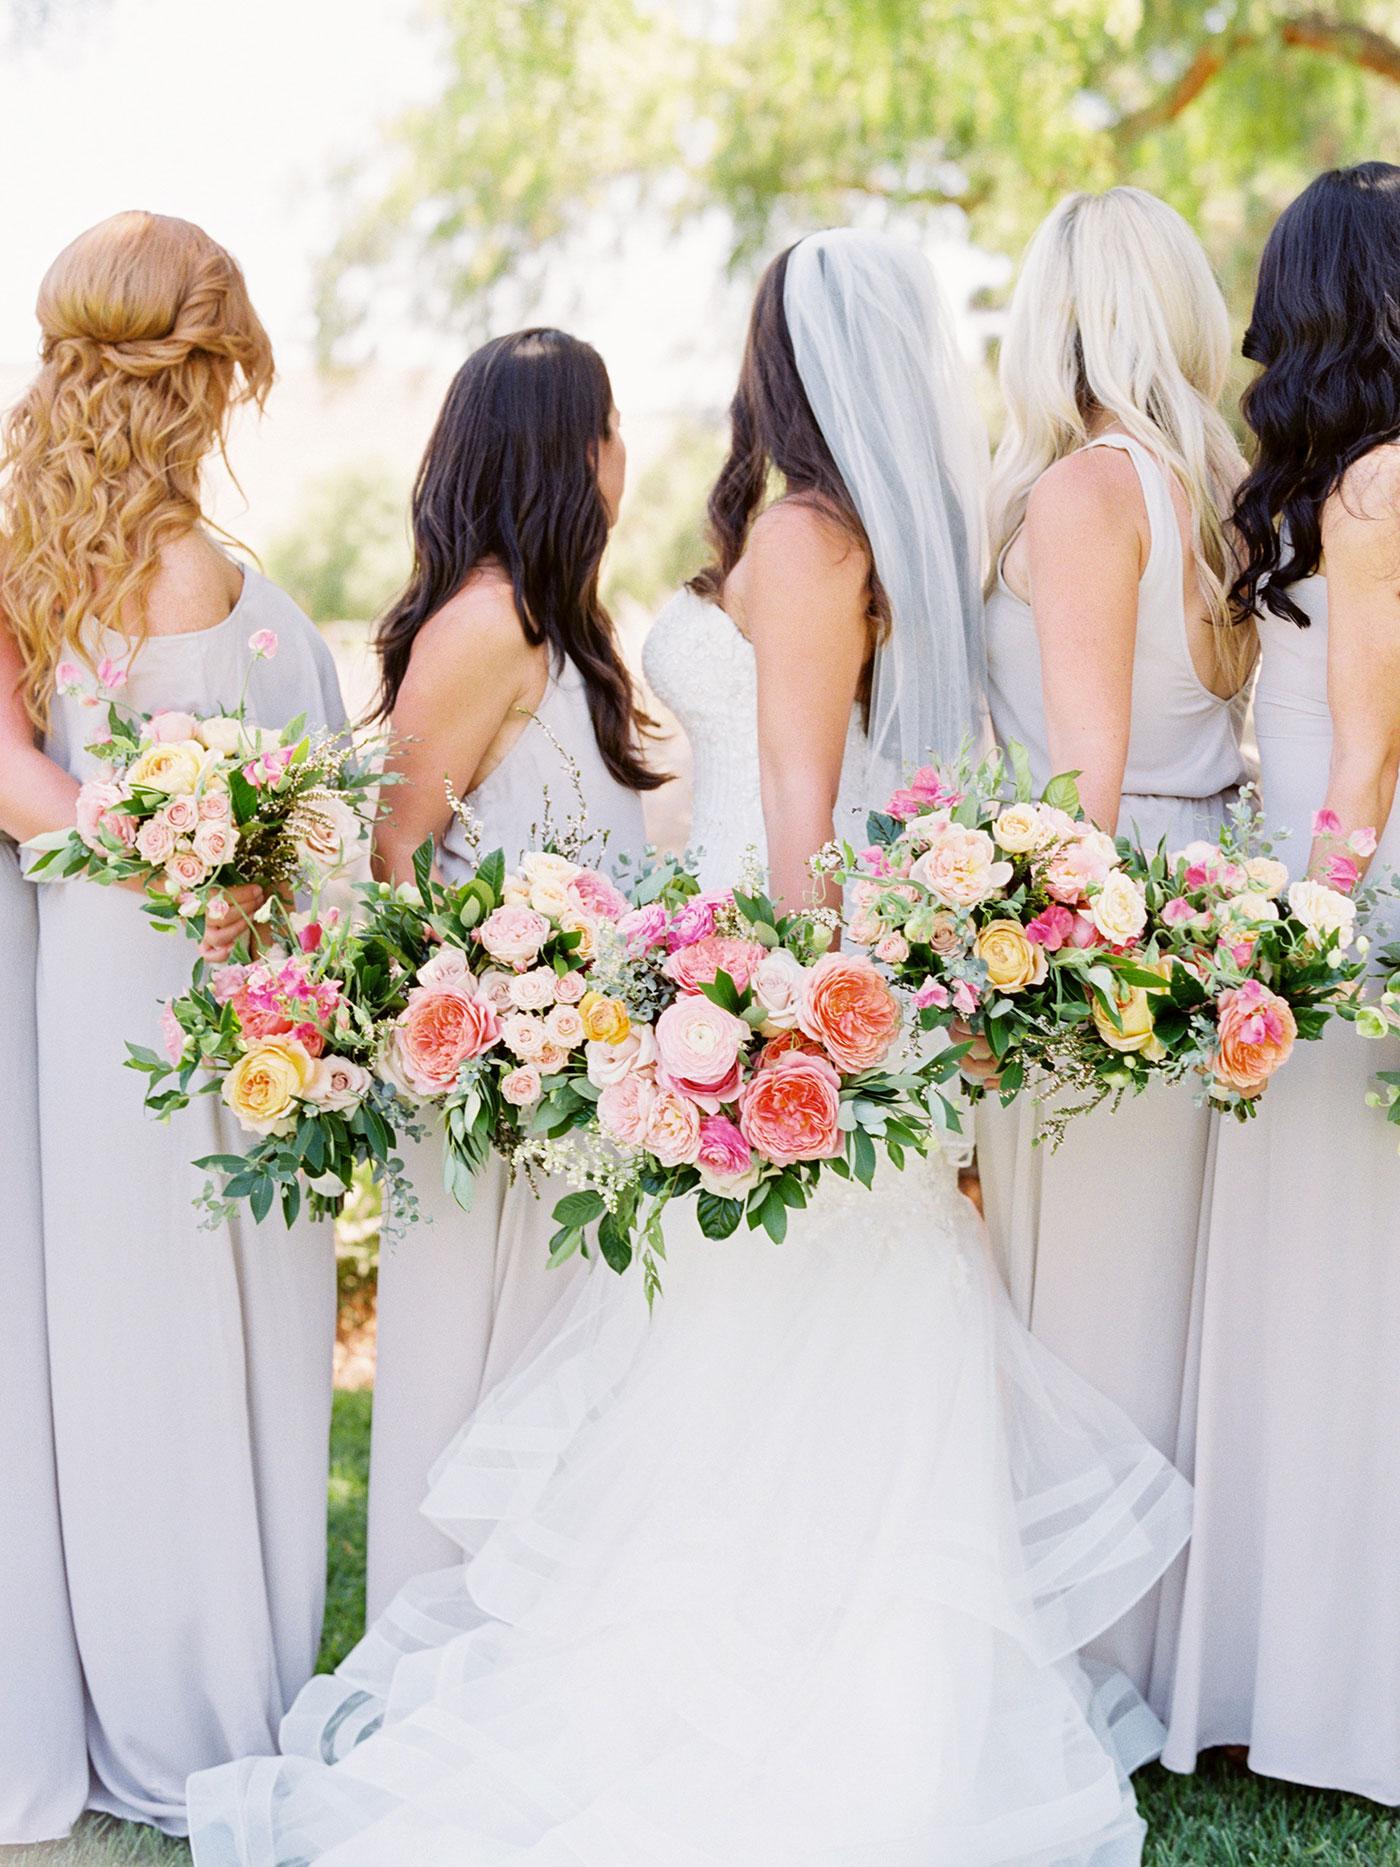 Bride & Bridal Party Bouquets